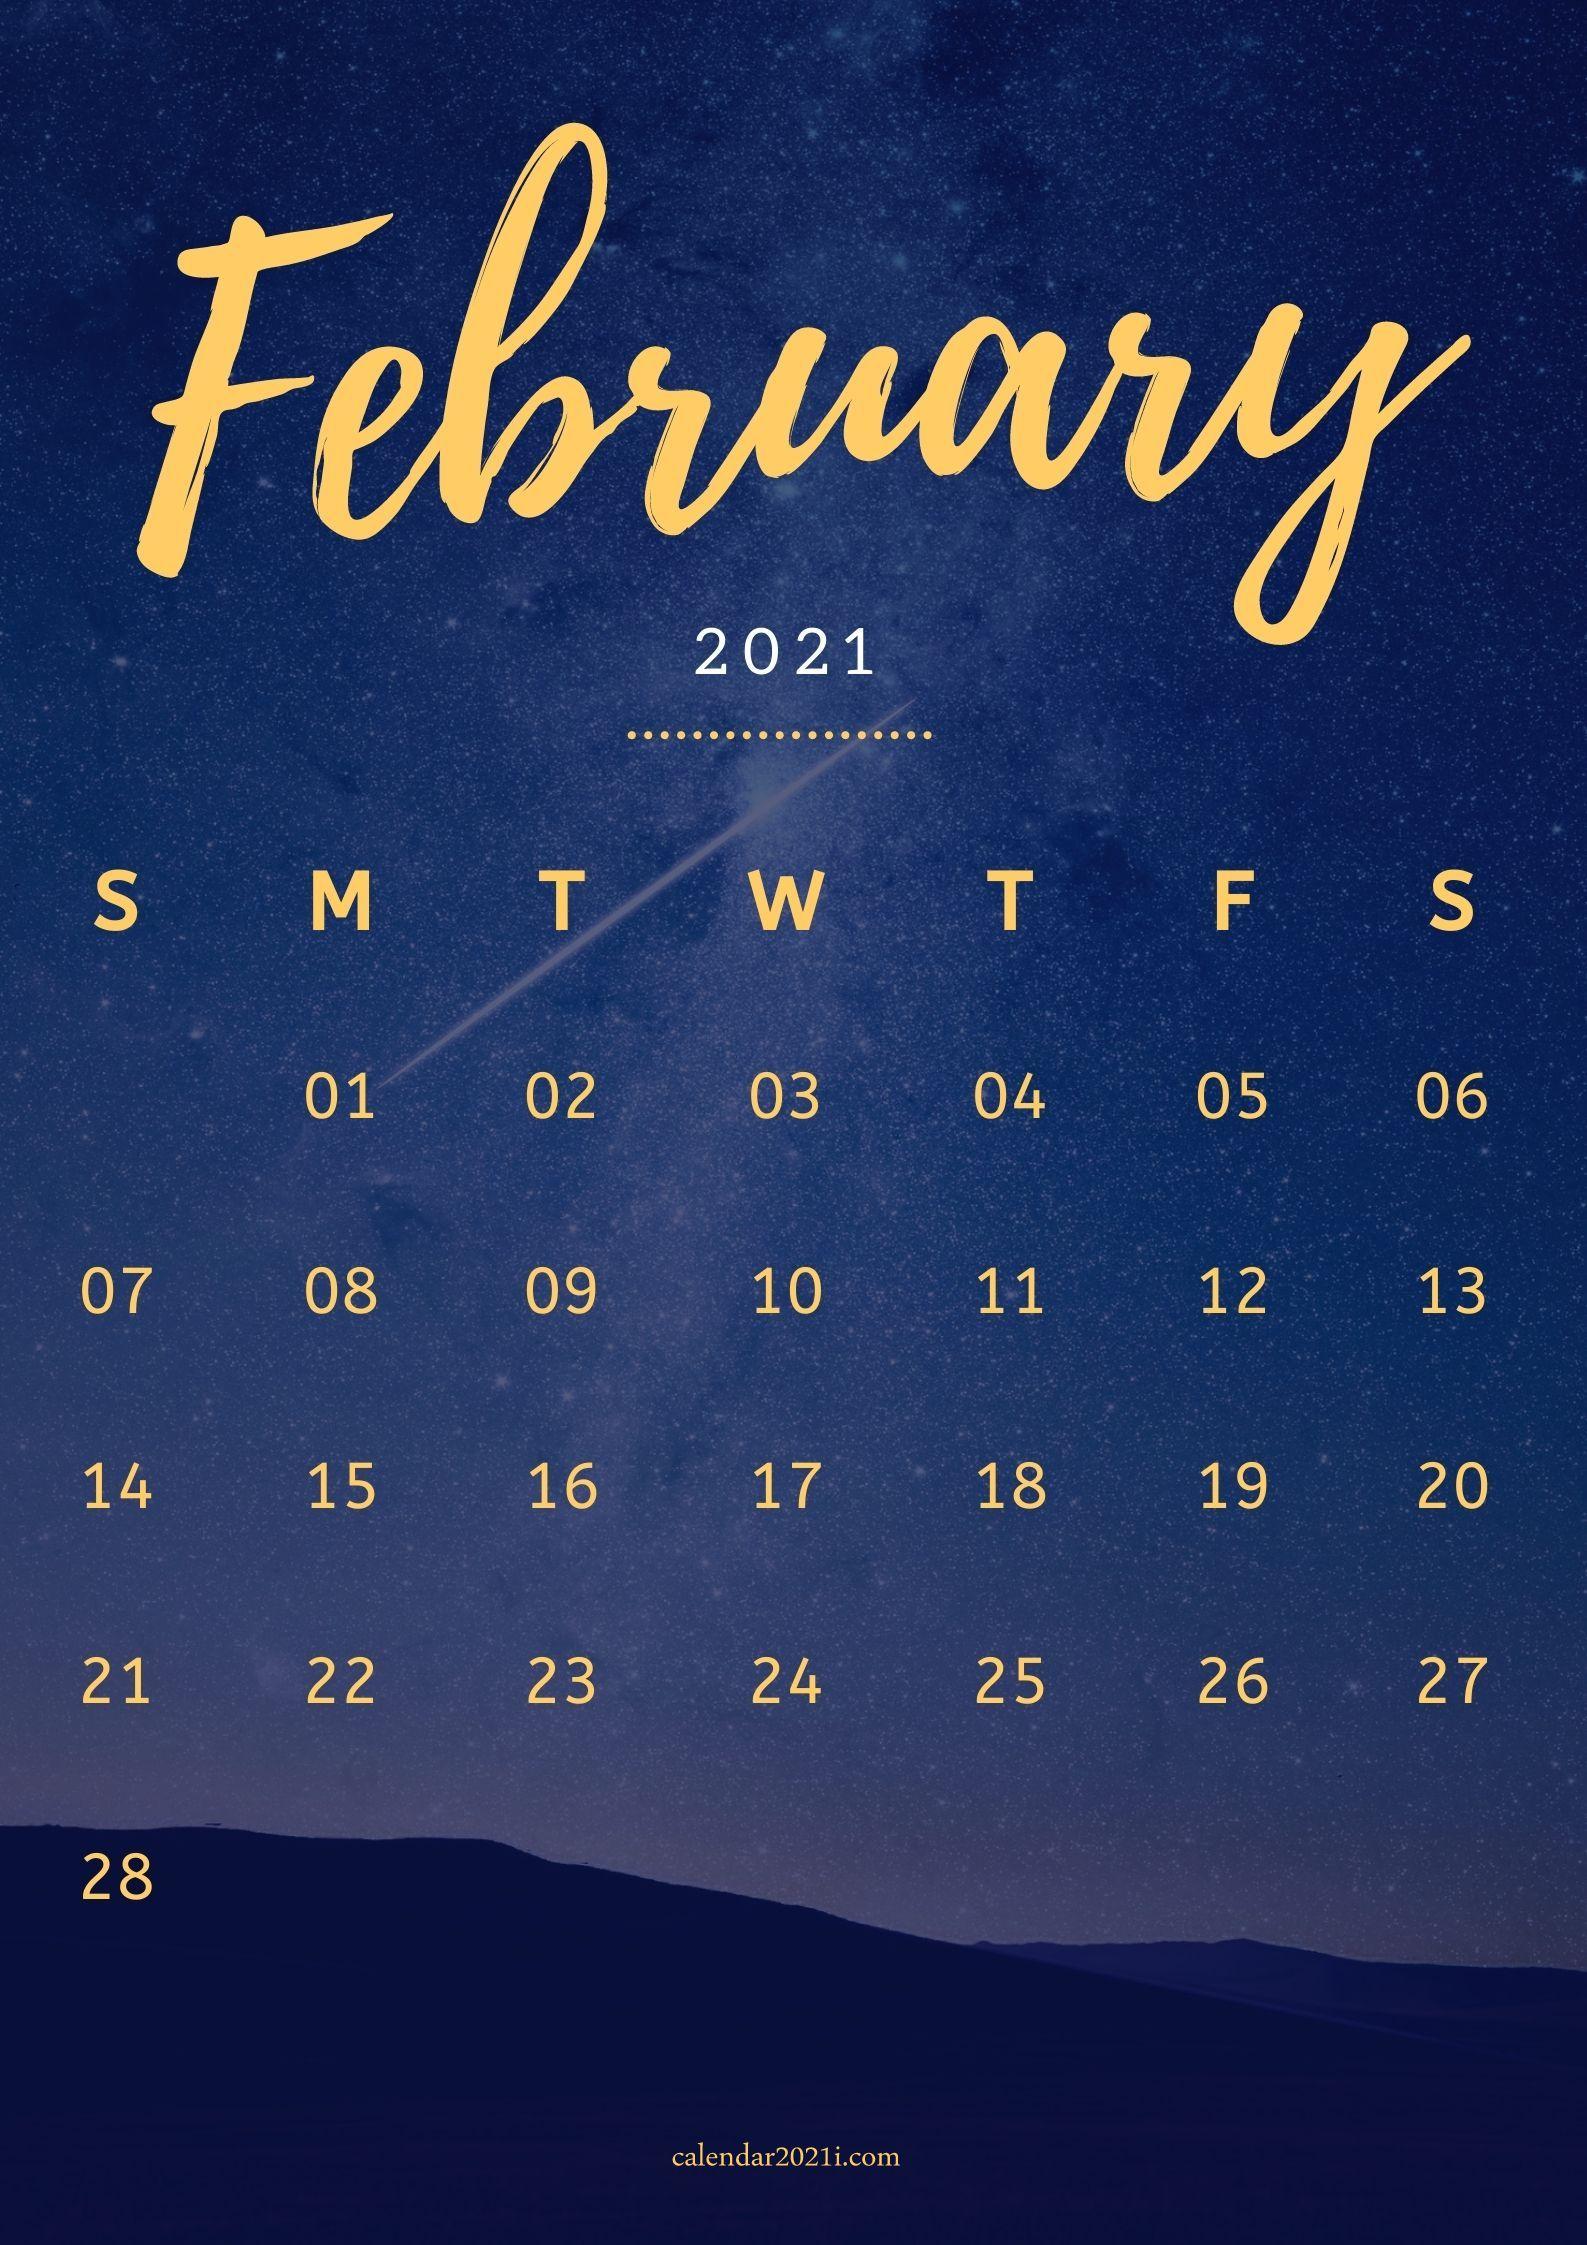 iPhone February 2021 Calendar Wallpapers Download Calendar 2021